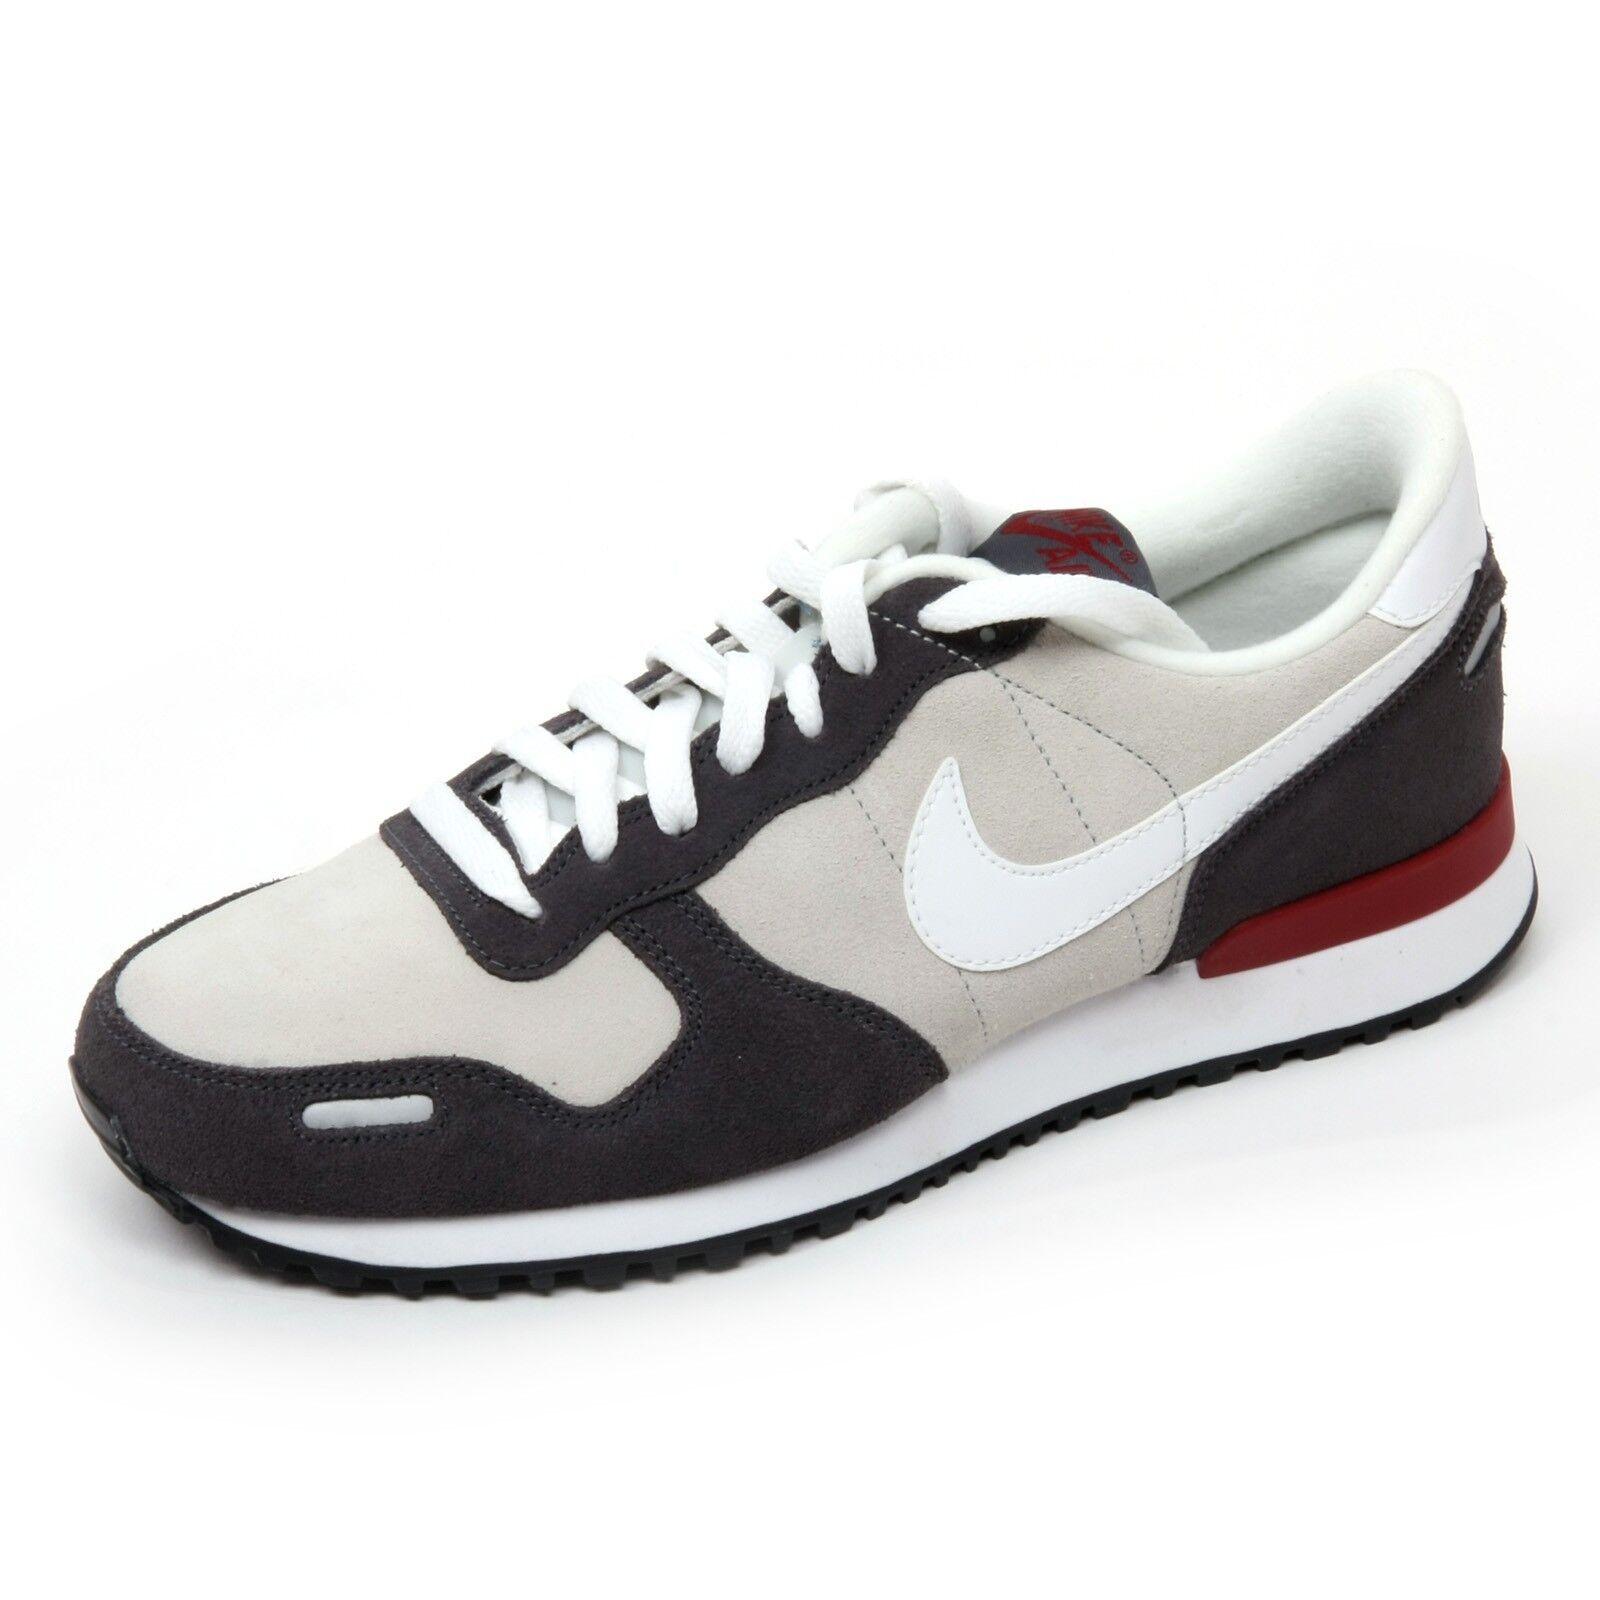 C0017 sneaker uomo NIKE AIR VORTEX LEATHER scarpa grigio/bianco shoe man